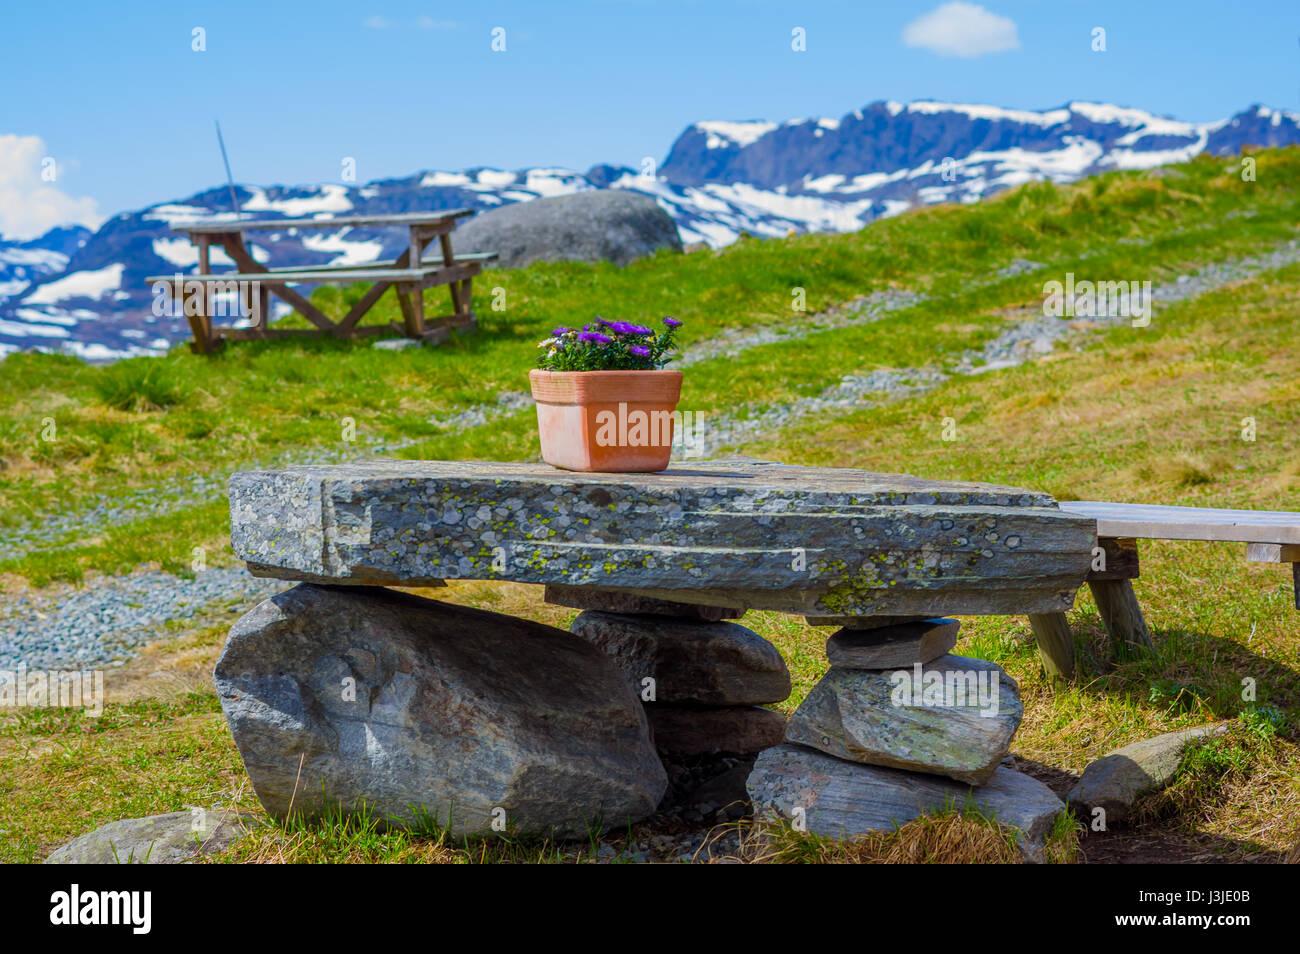 VALDRES, NORWAY - 6 JULY, 2015: Fantastic picninc spots along roadway crossing Valdresflya mountain range with stunning - Stock Image